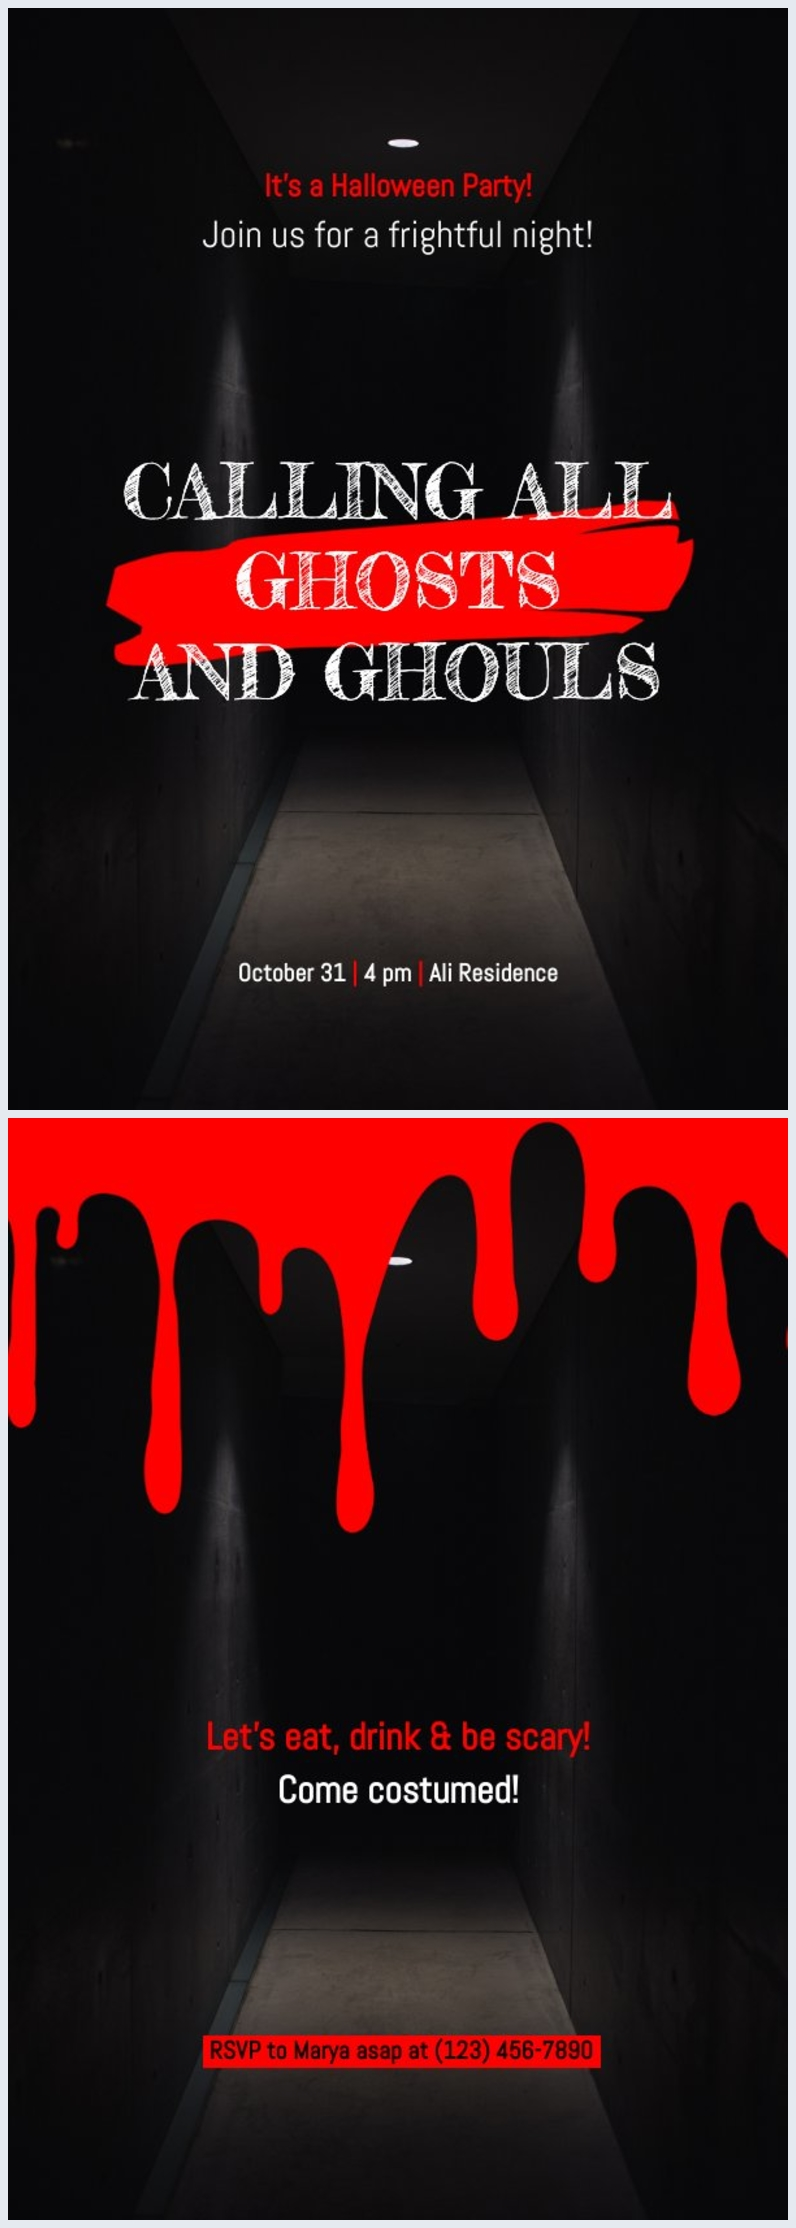 Modèle d'invitation Halloween